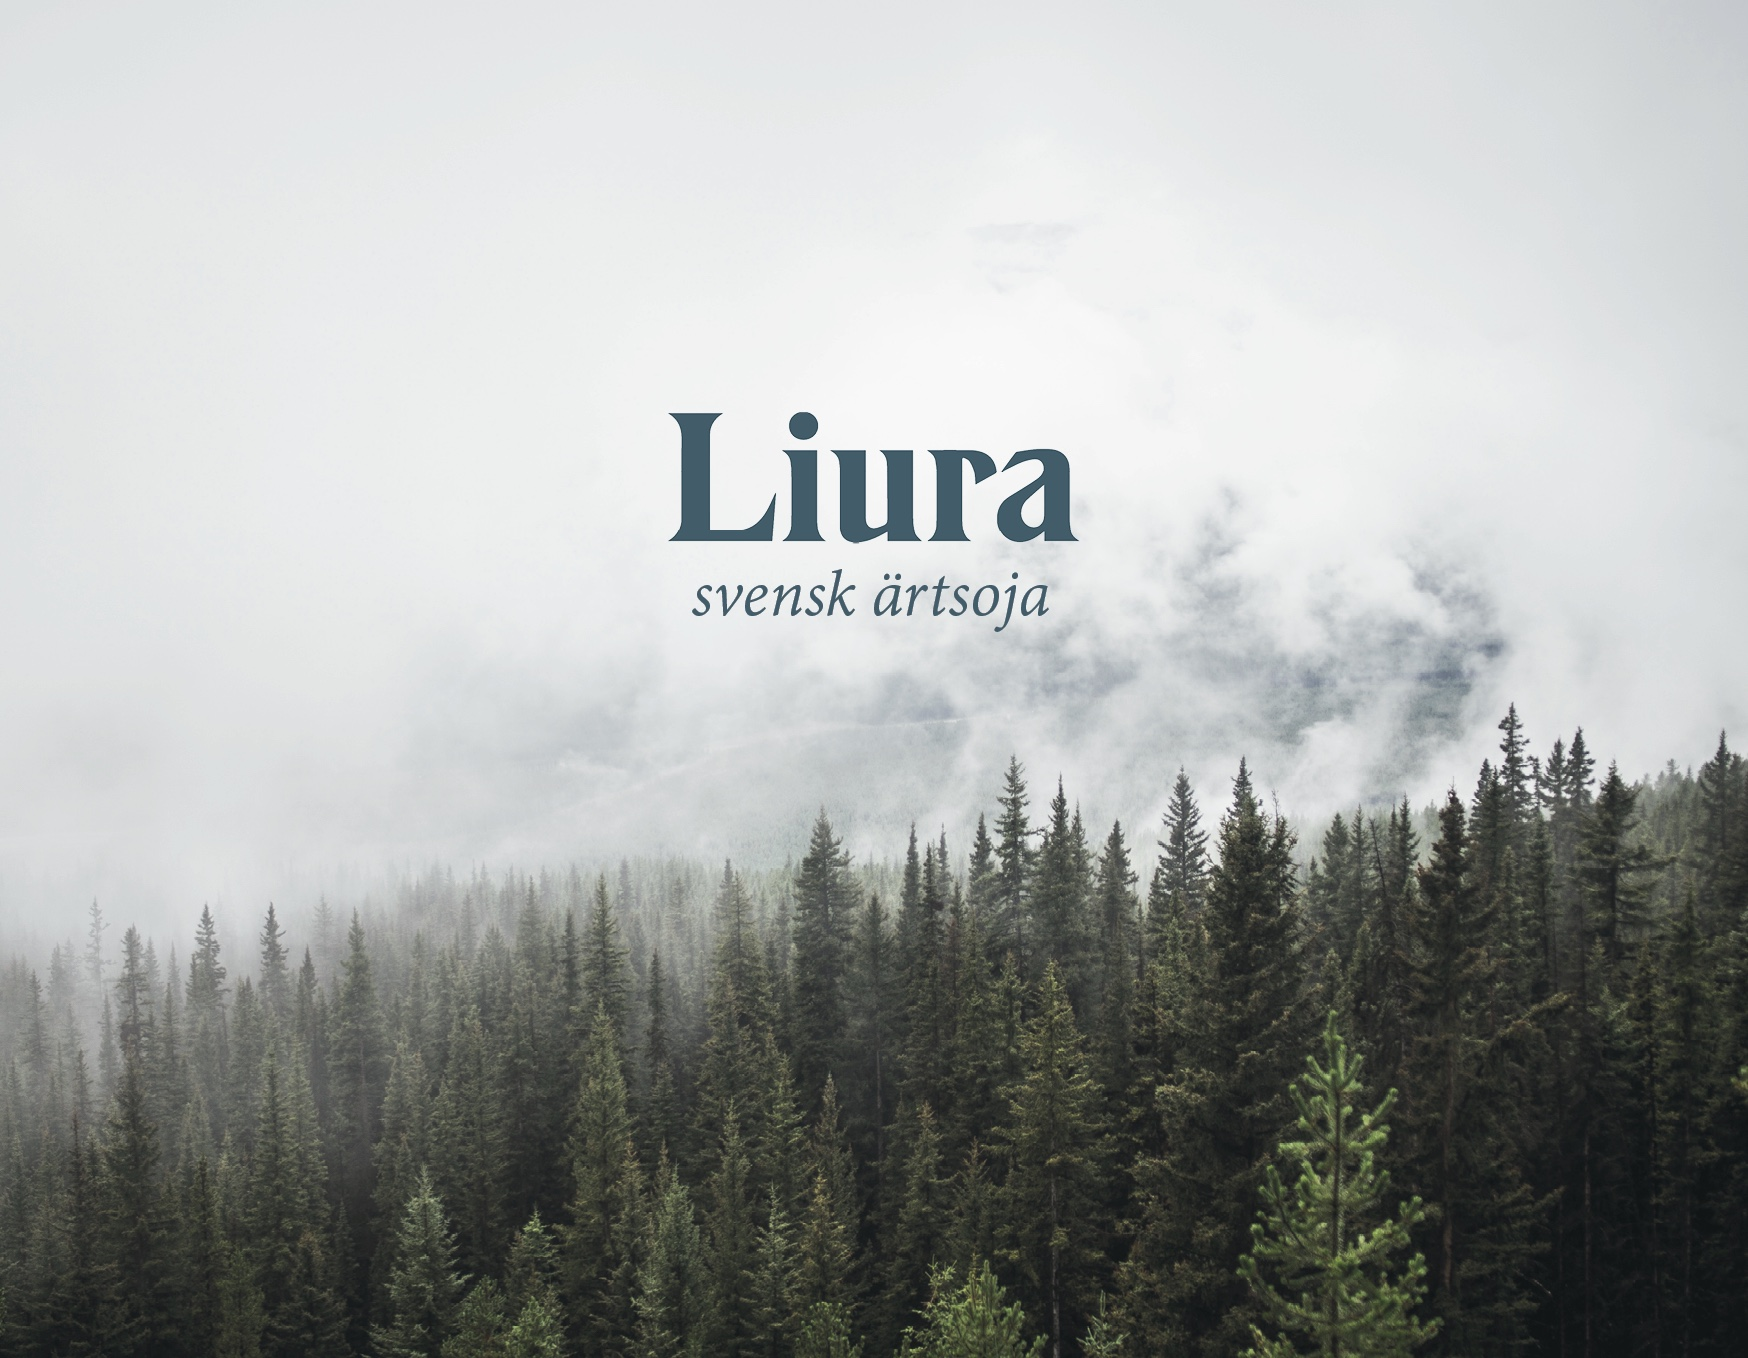 LIURA_BILD.jpg